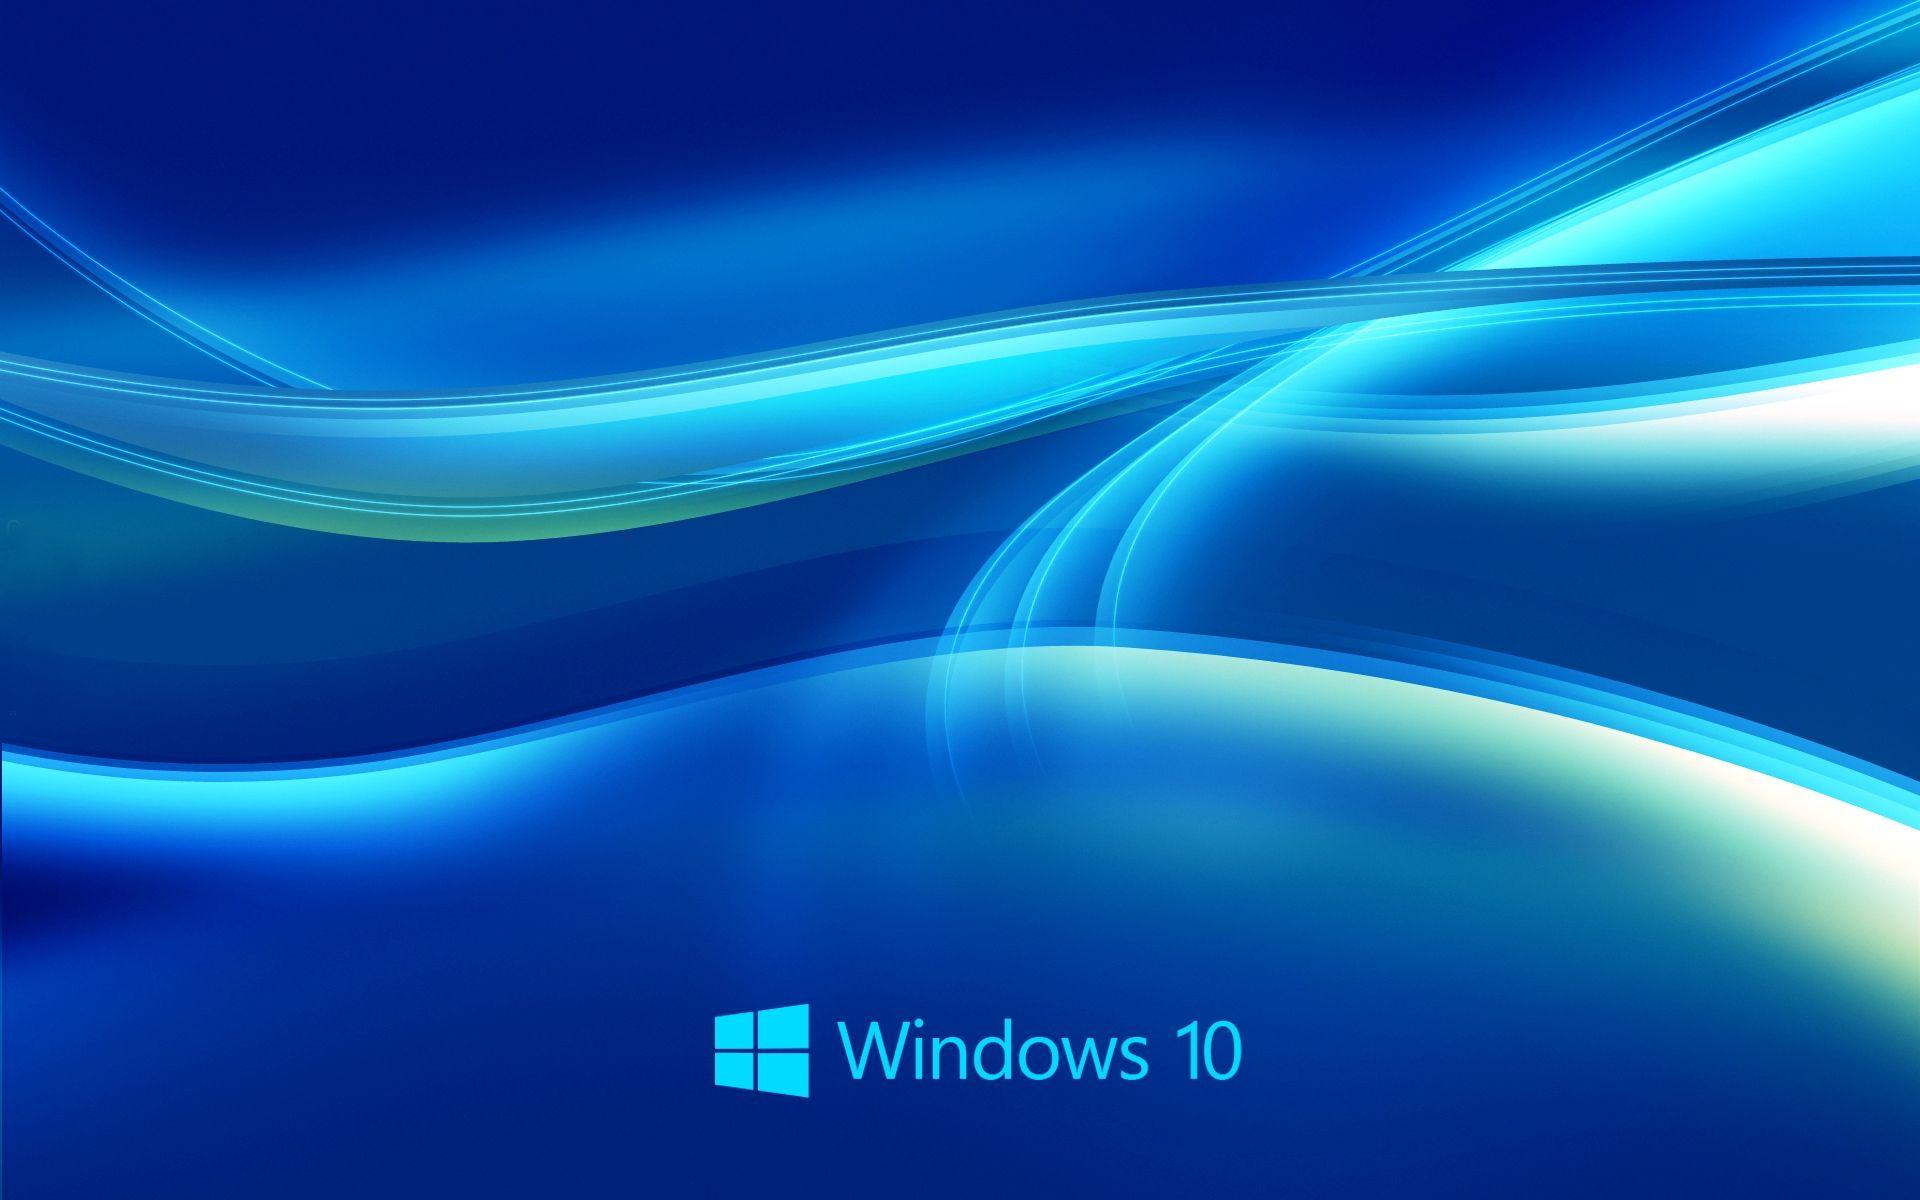 Windows 10 graphics hd wallpaper hdwalllpapers computers windows 10 graphics hd wallpaper hdwalllpapers voltagebd Images